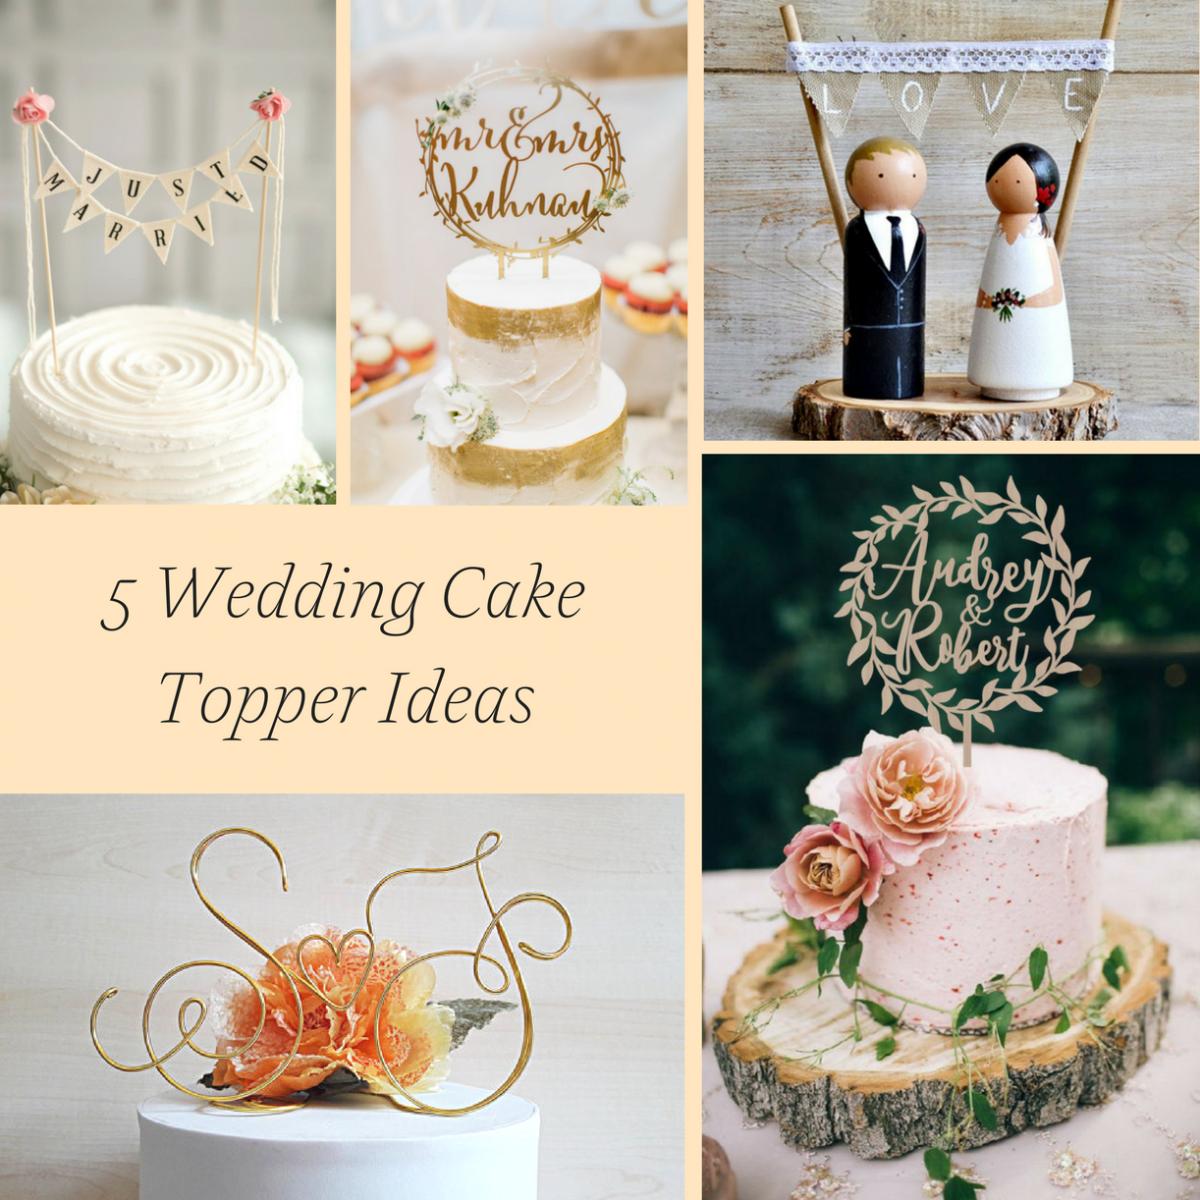 5 Wedding Cake Topper Ideas Hill City Bride Virginia